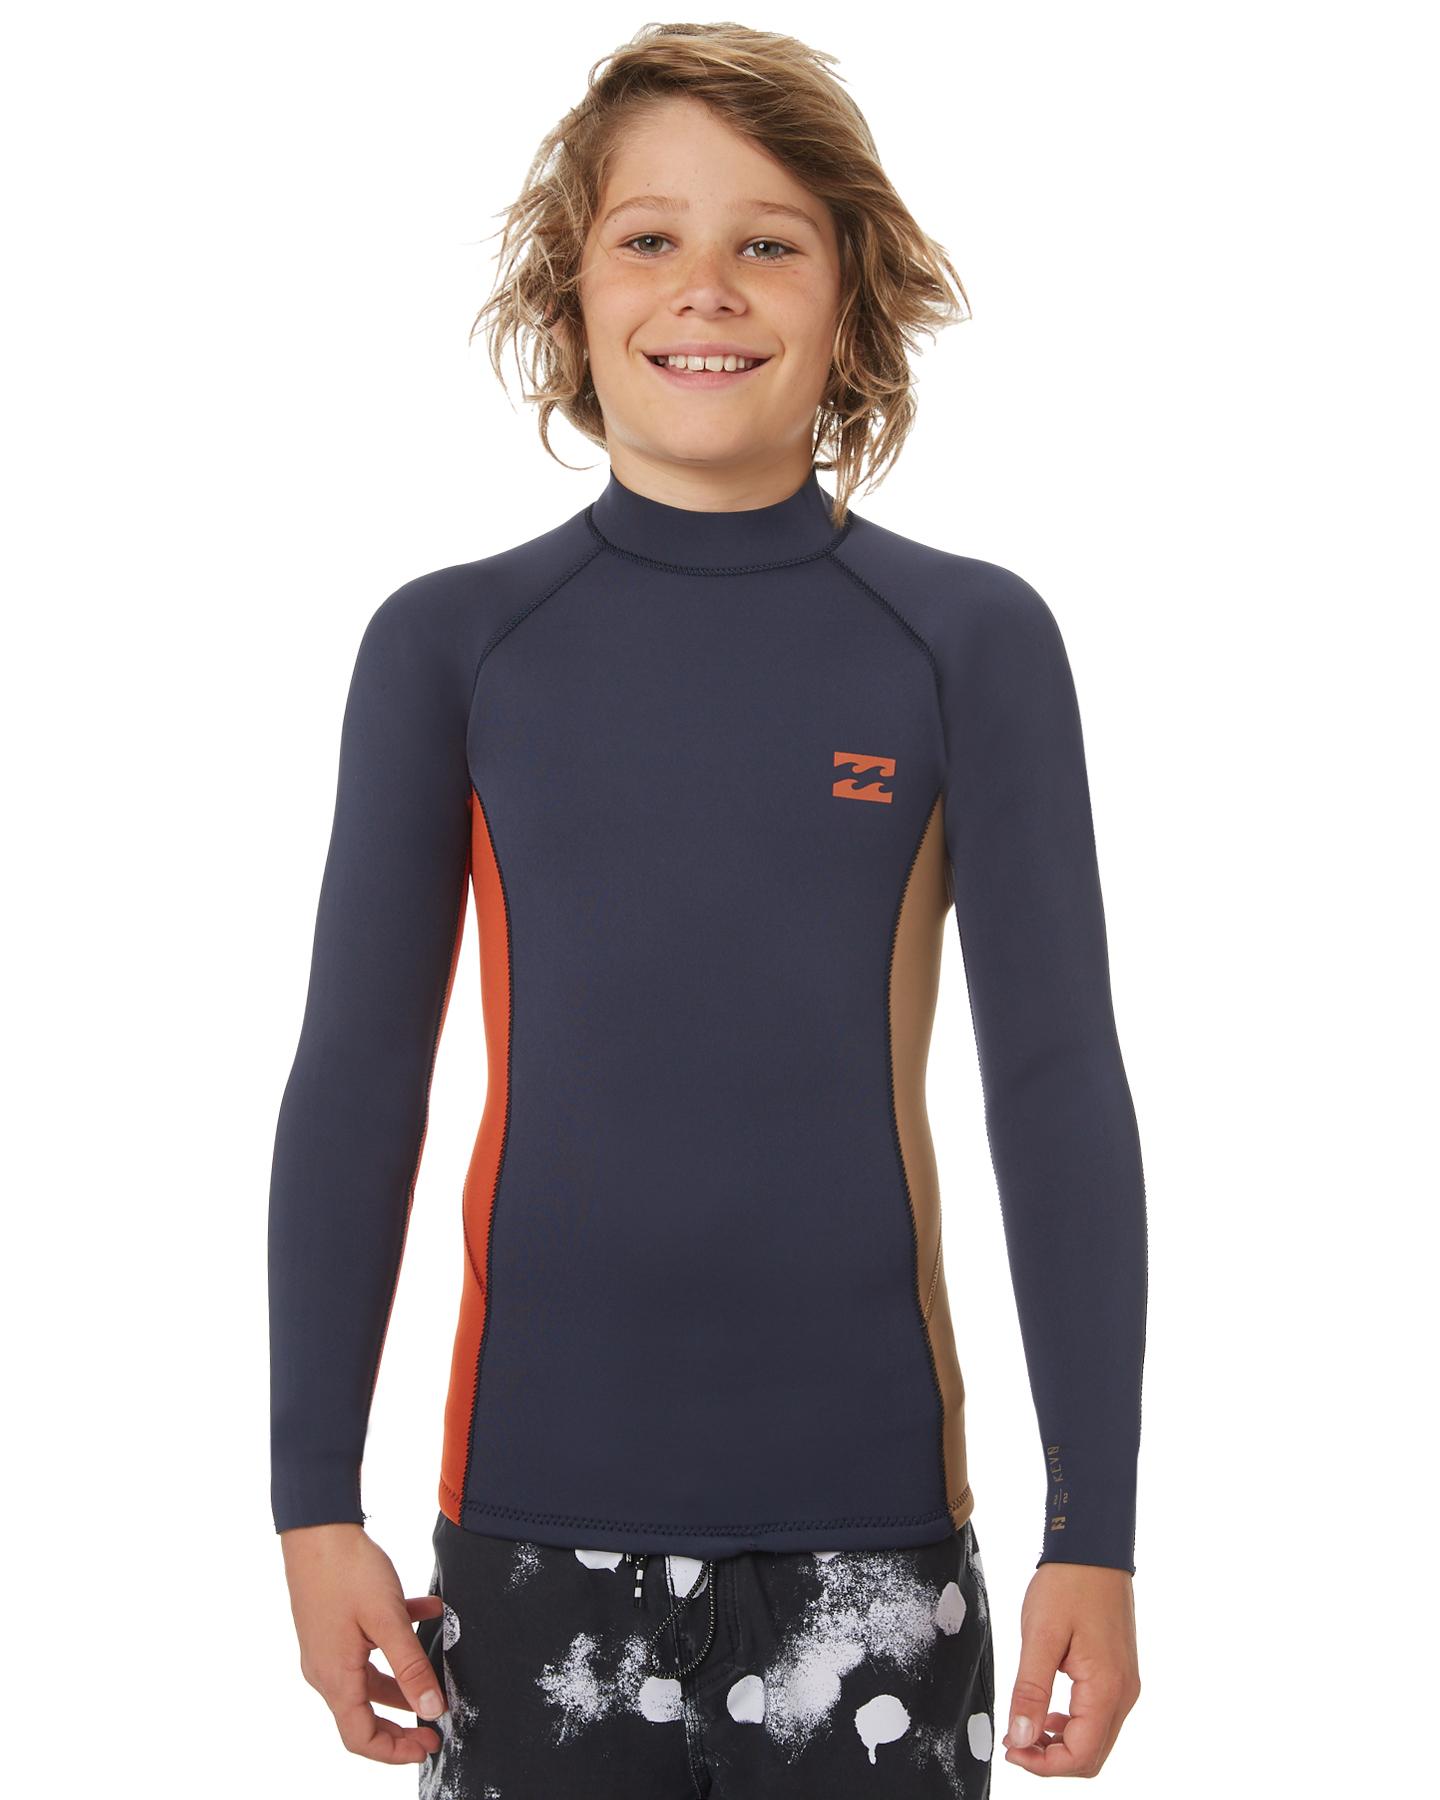 9601cf2fdcb58 Billabong Boys Revolution 202 Wetsuit Jacket Slate Surfing Wetsuits ...